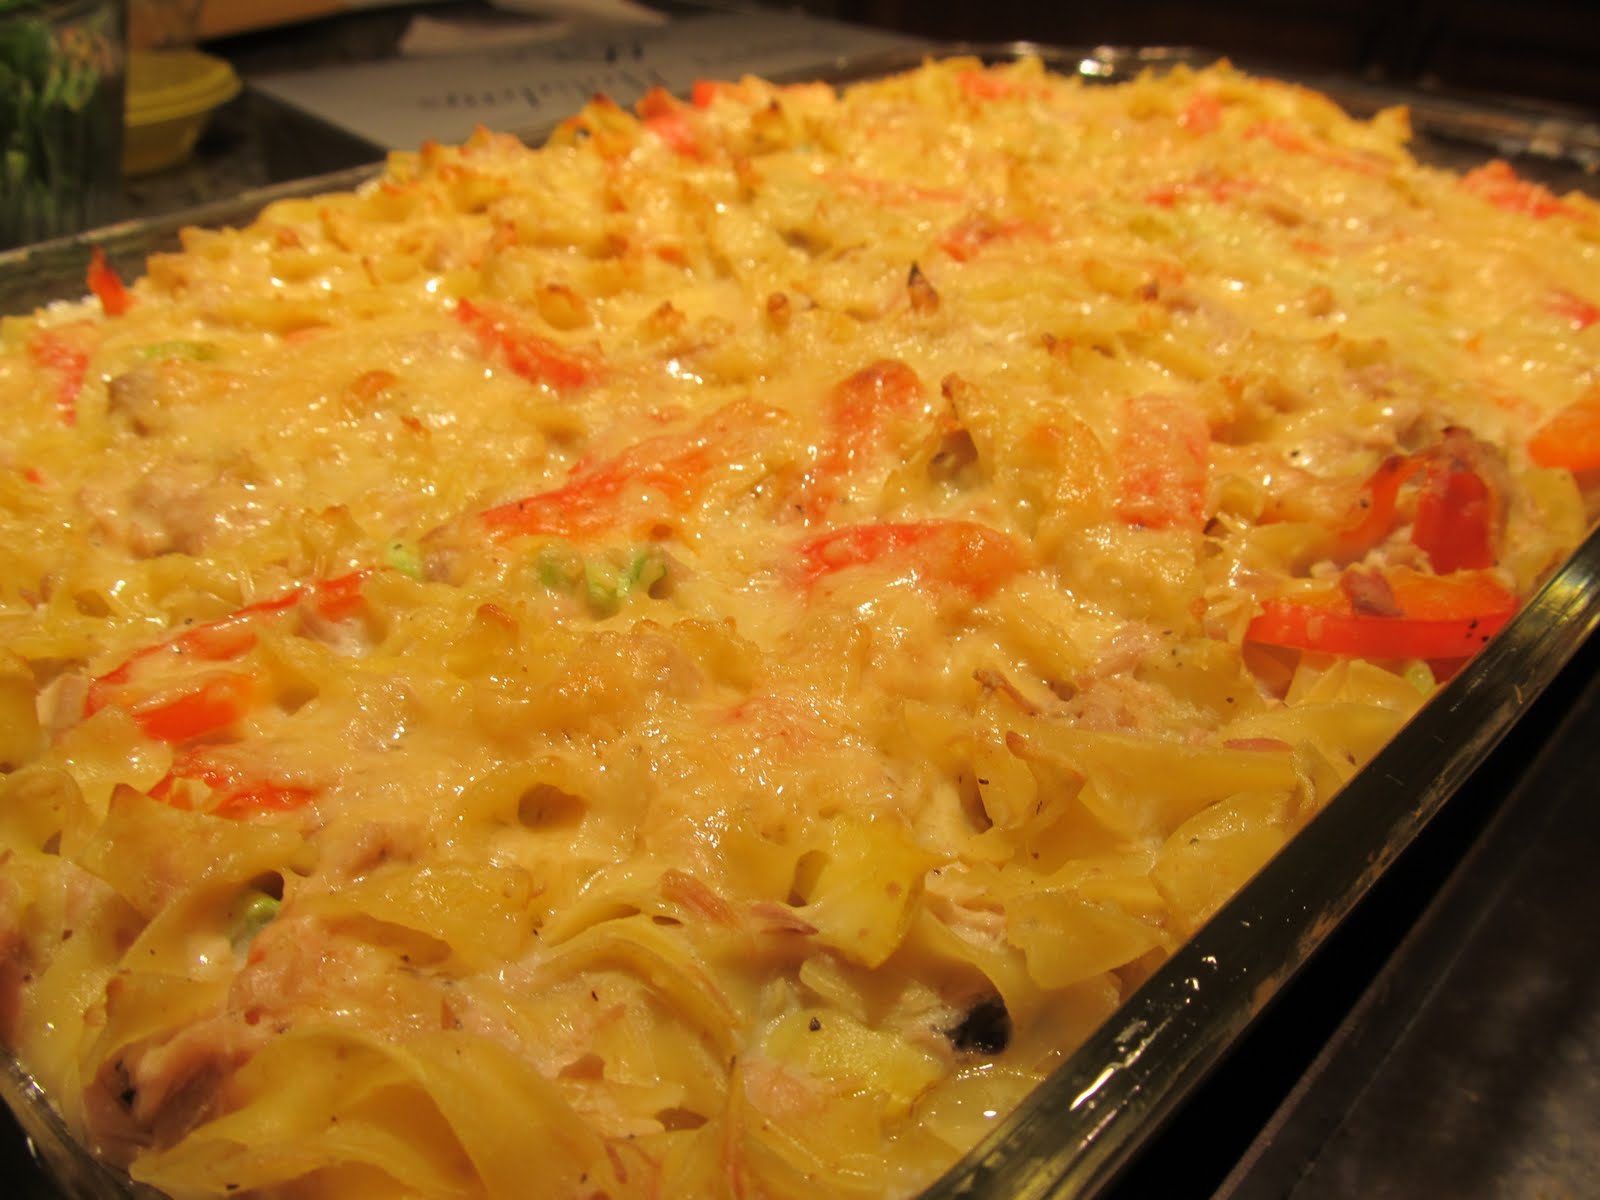 Mediterranean Tuna-Noodle Casserole